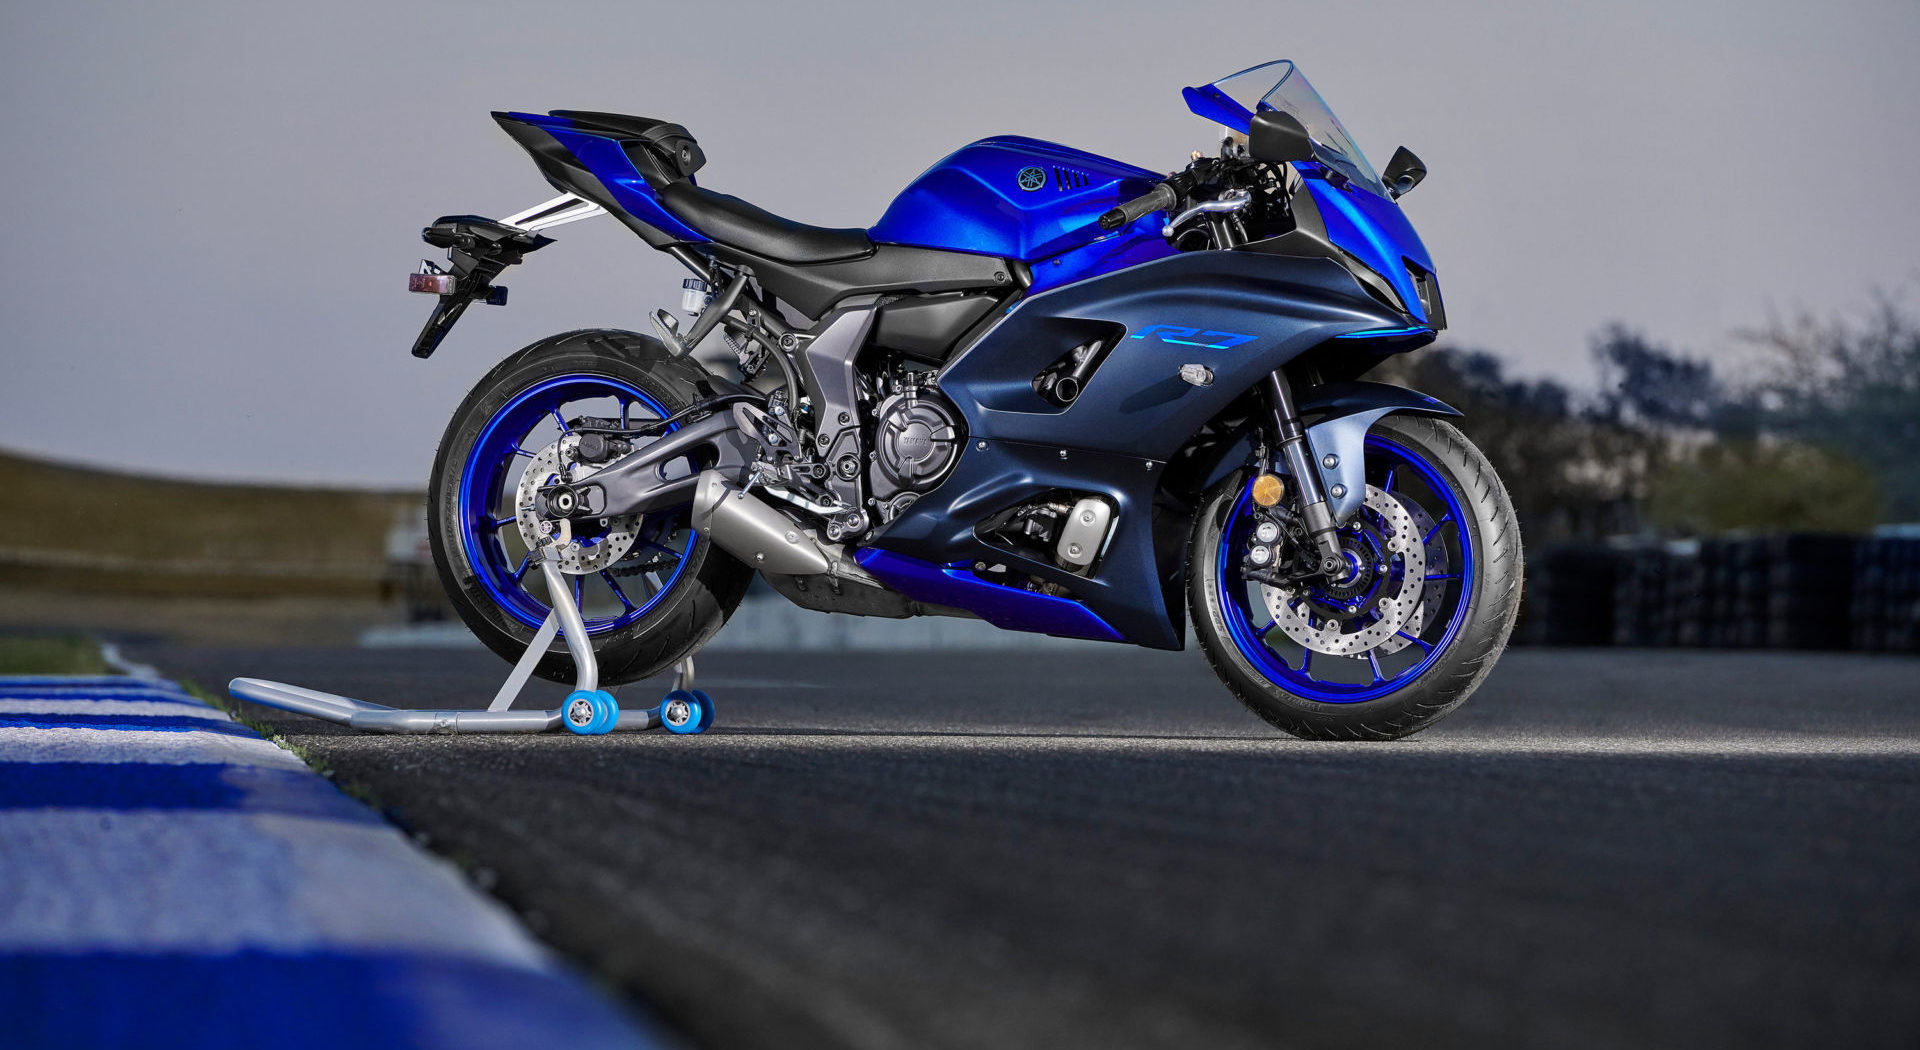 A 2022-model Yamaha YZF-R7 fitted with Bridgestone BATTLAX HYPERSPORT S22 tires. Photo courtesy Yamaha.